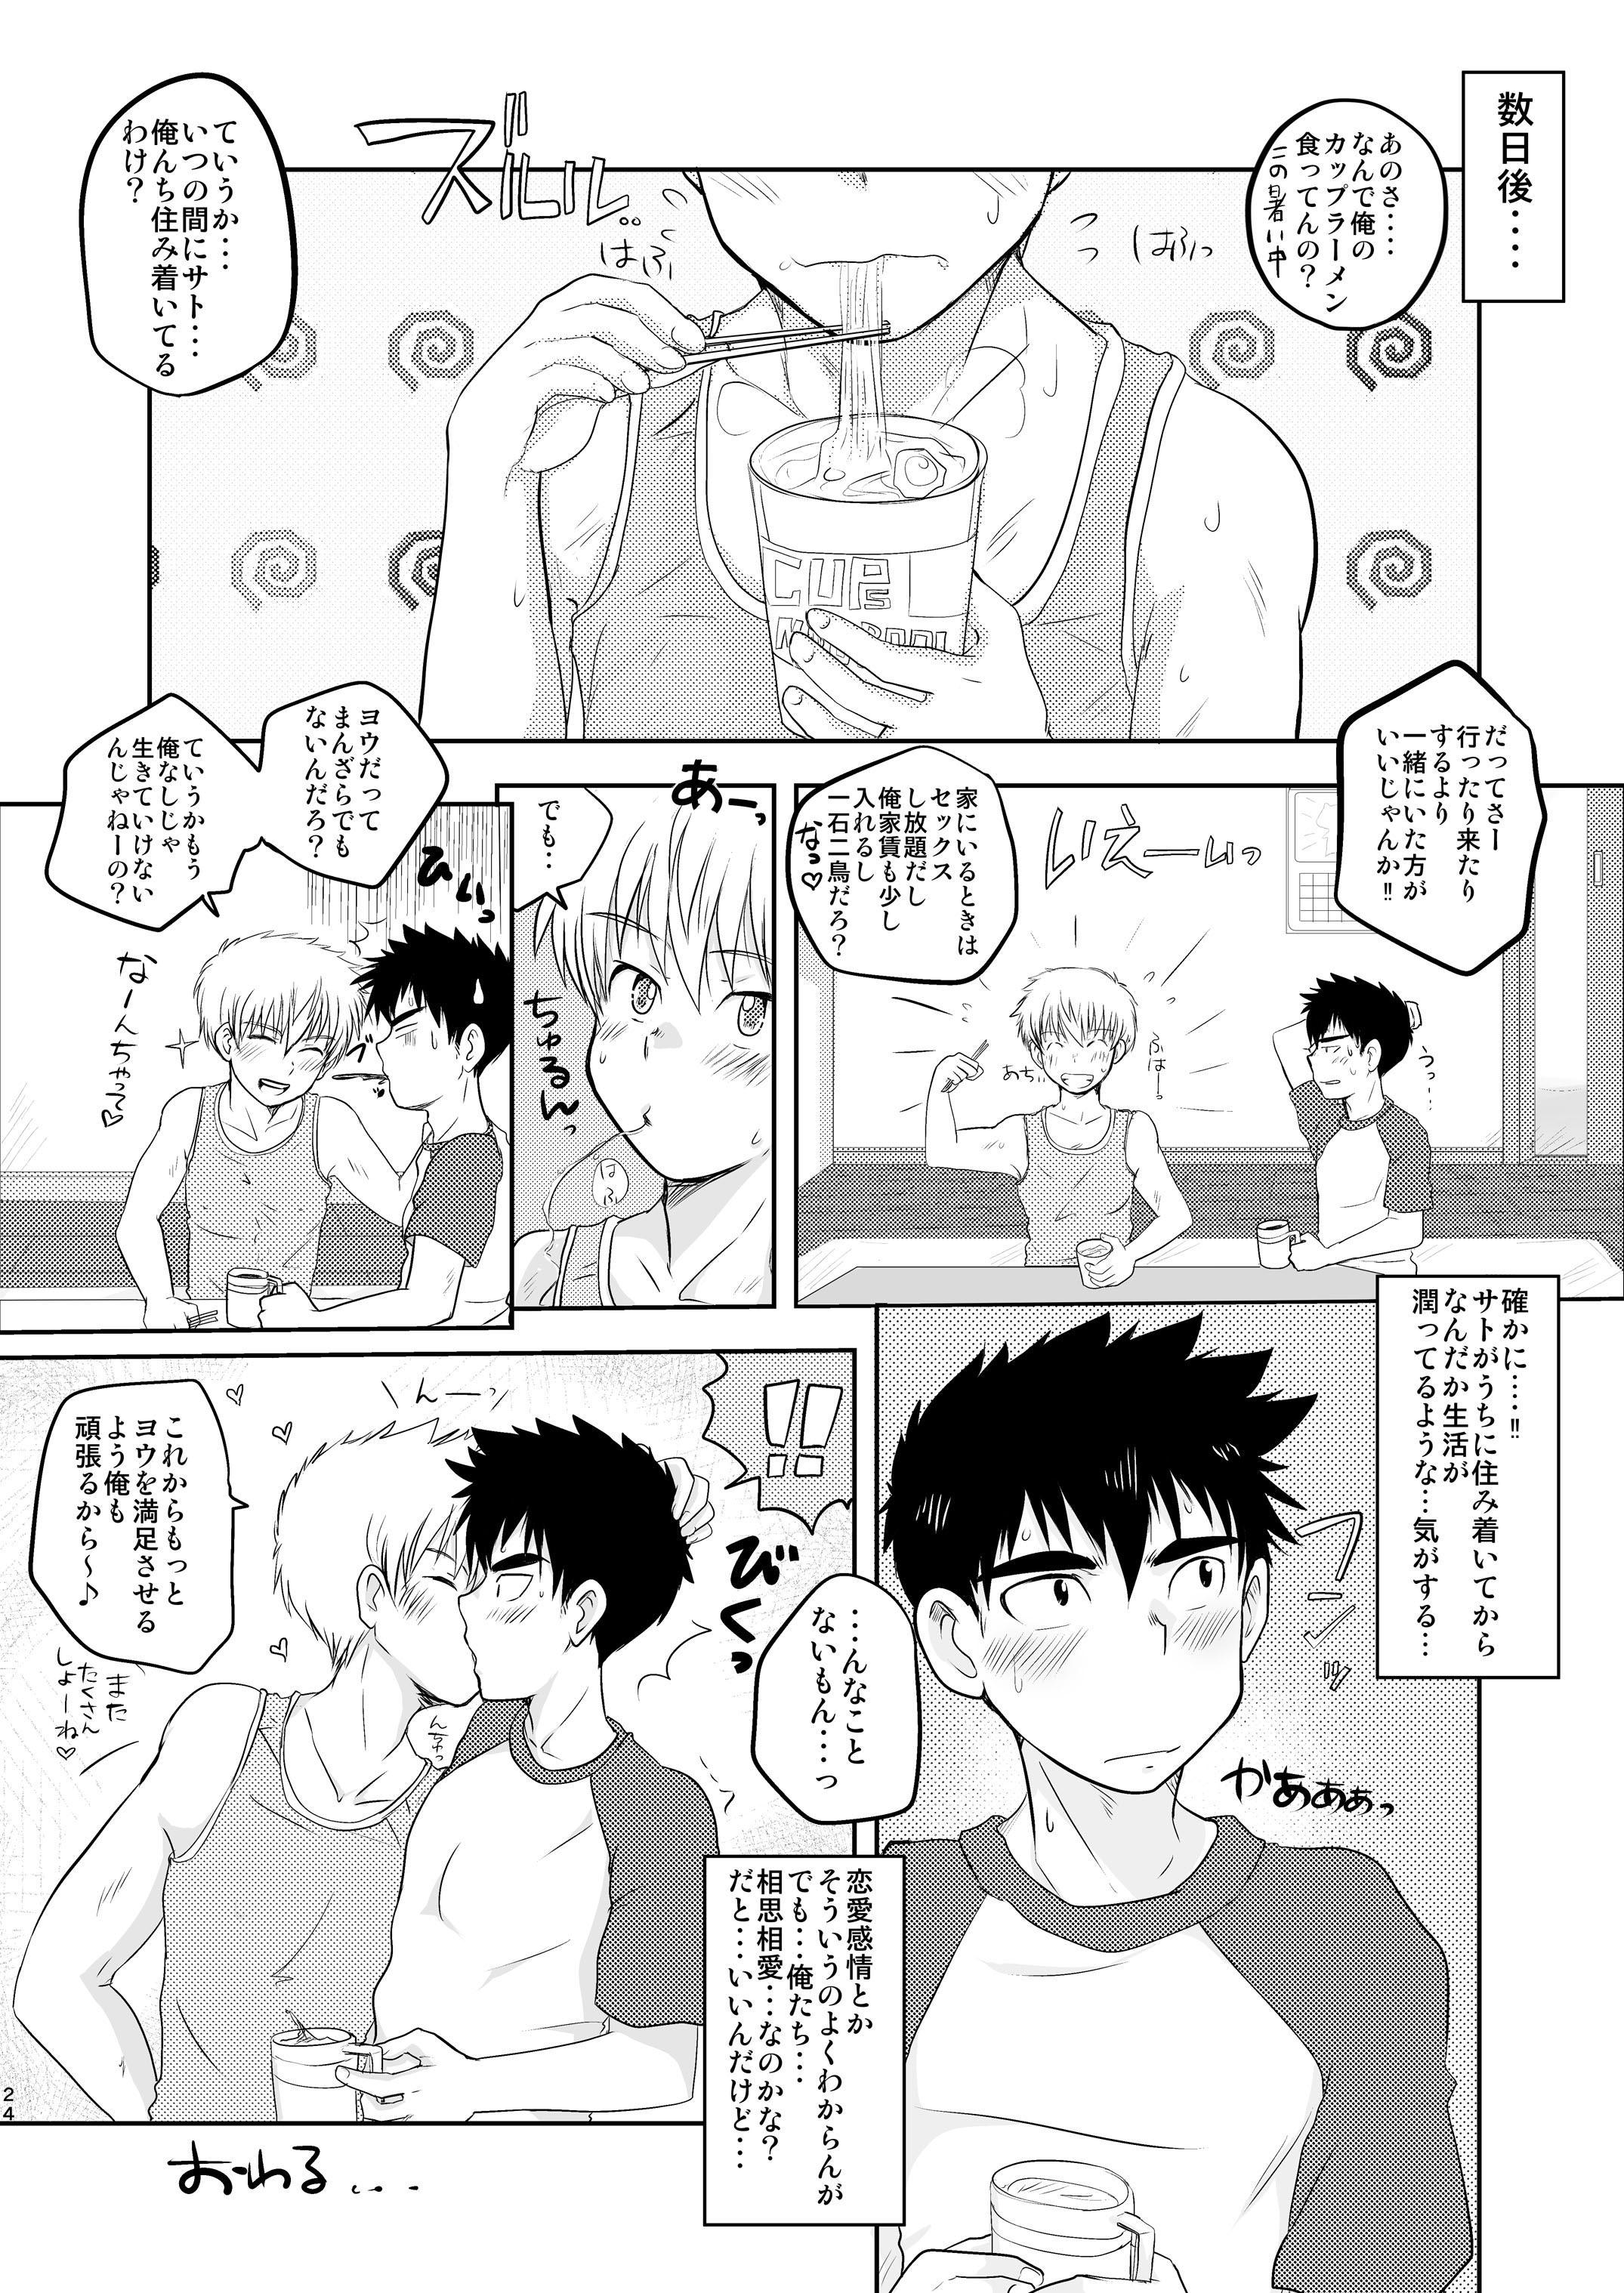 Ikenai! Ikenai! Omae ja Nai to..! 23